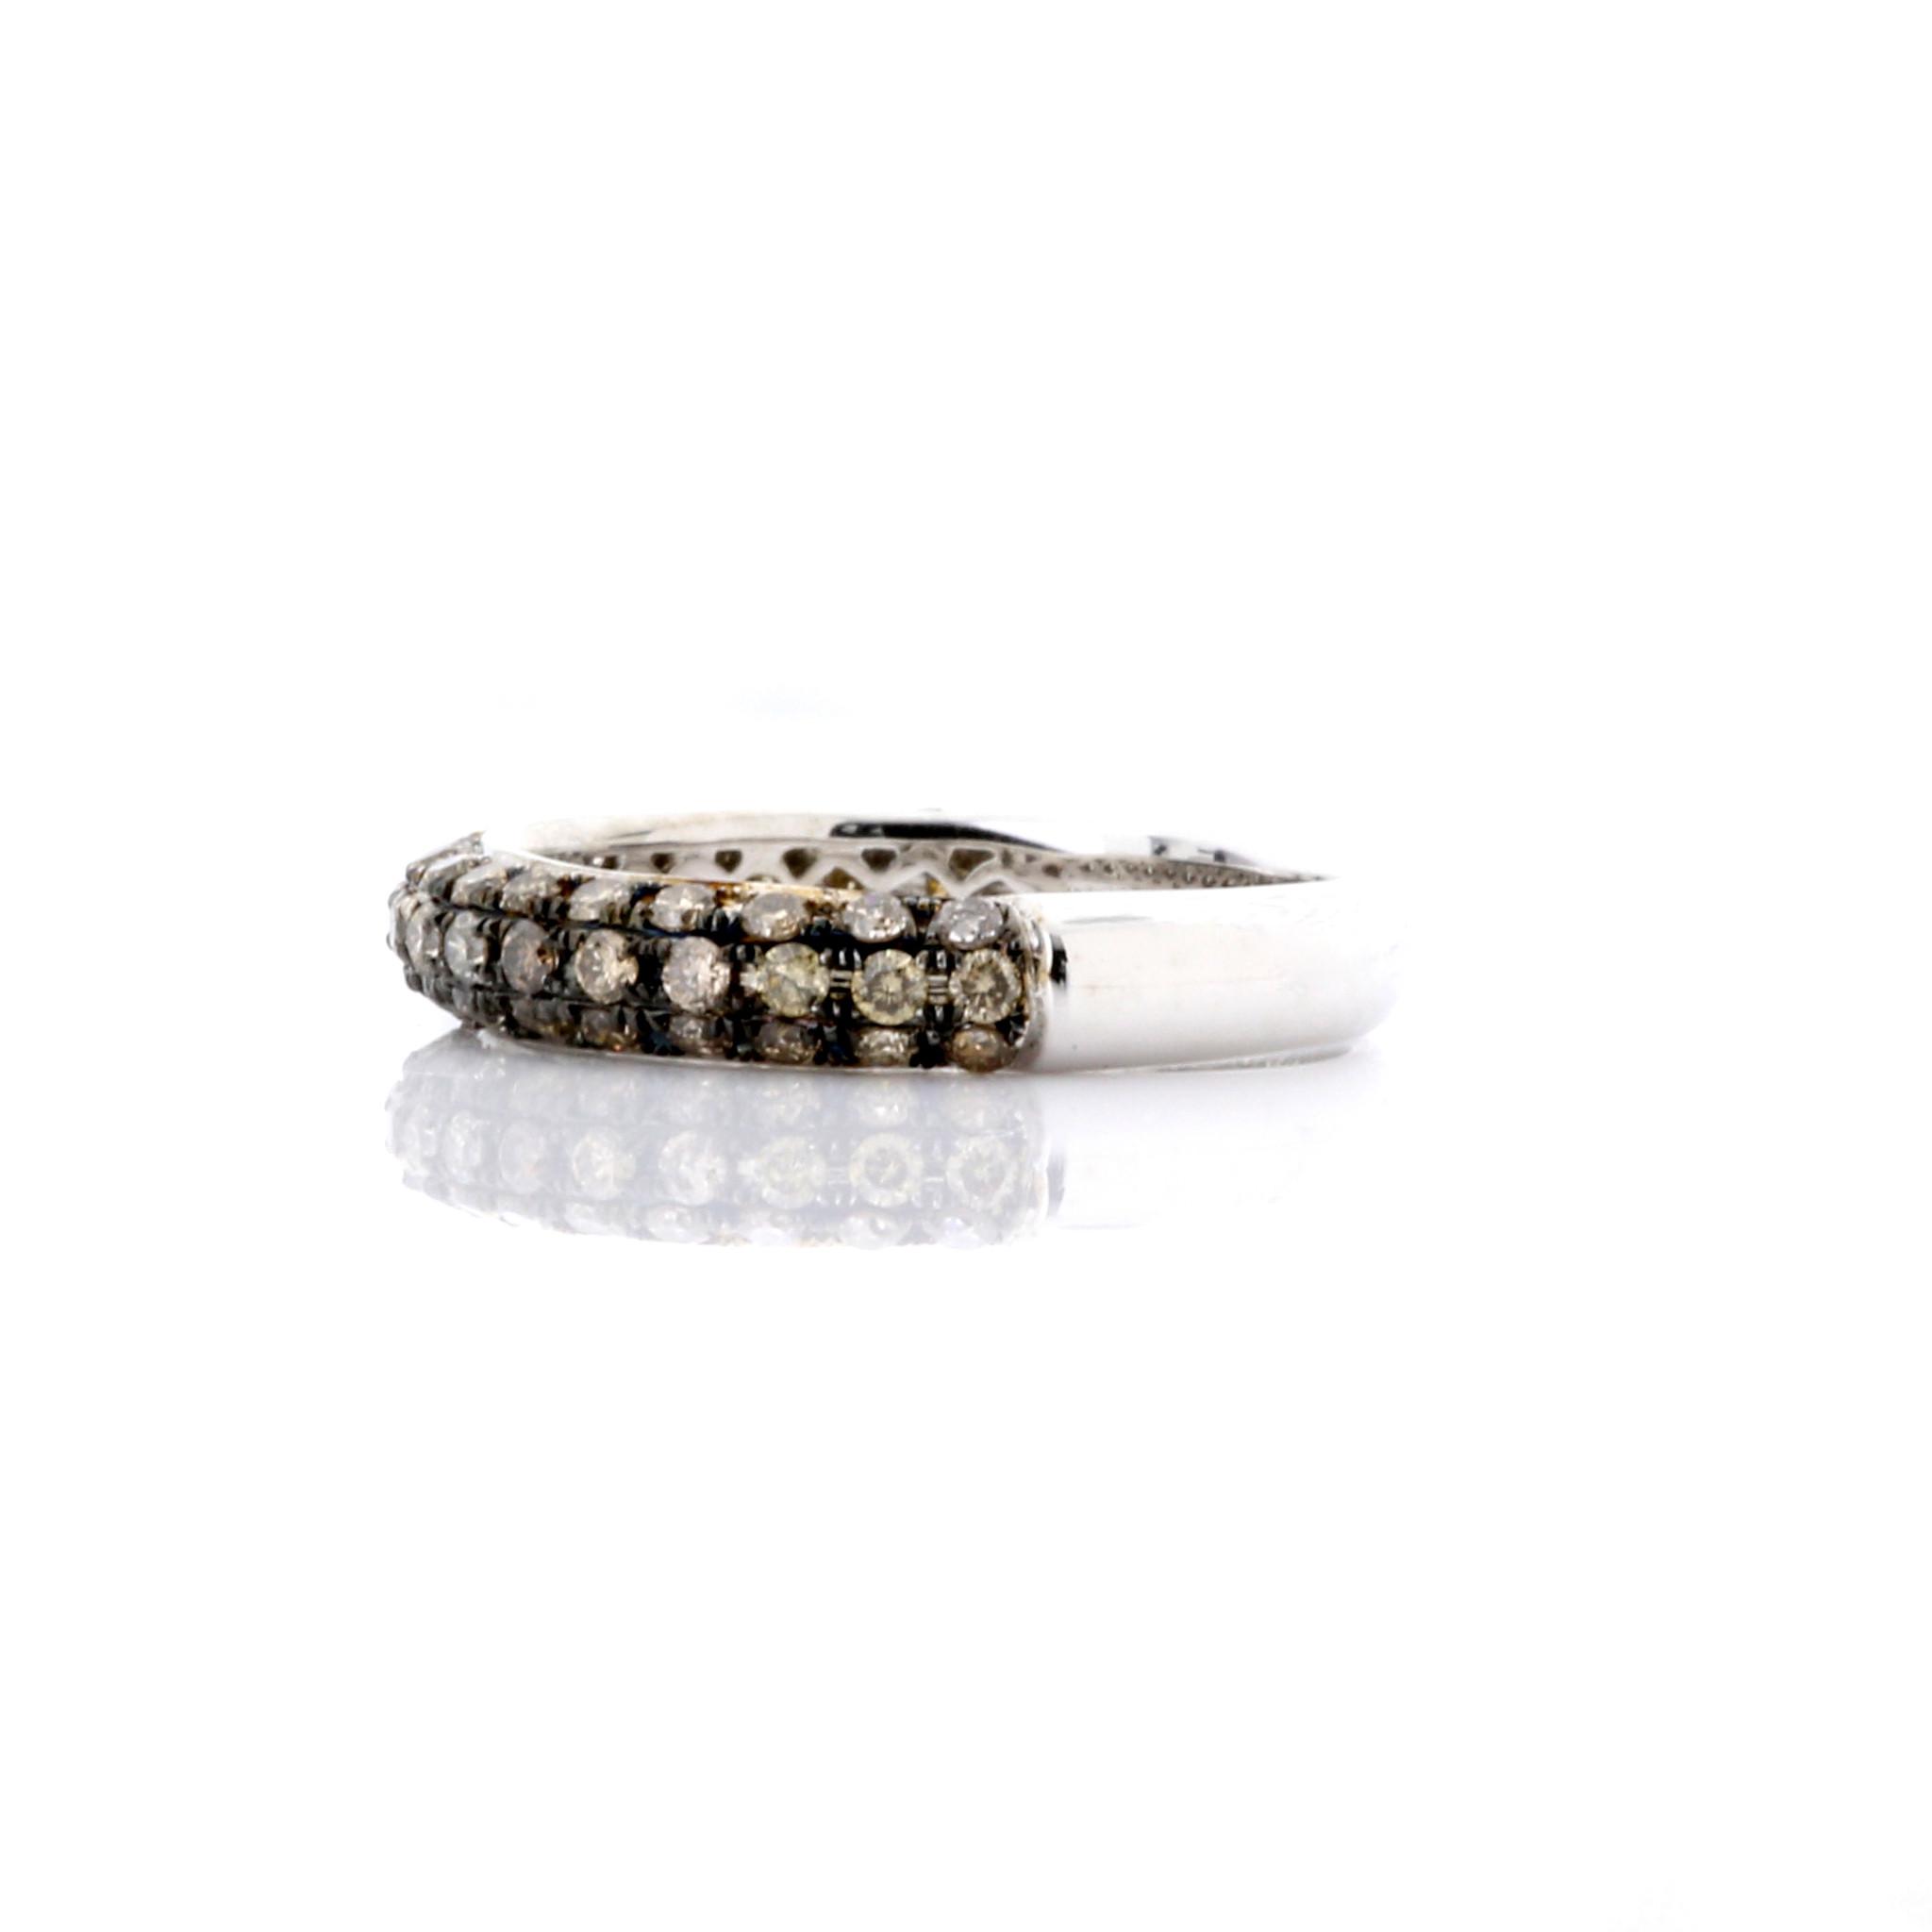 18k Rose Gold BROWN DIAMOND BAND RING 0.92ct Maddaloni Jewelers Long Island Jewelry